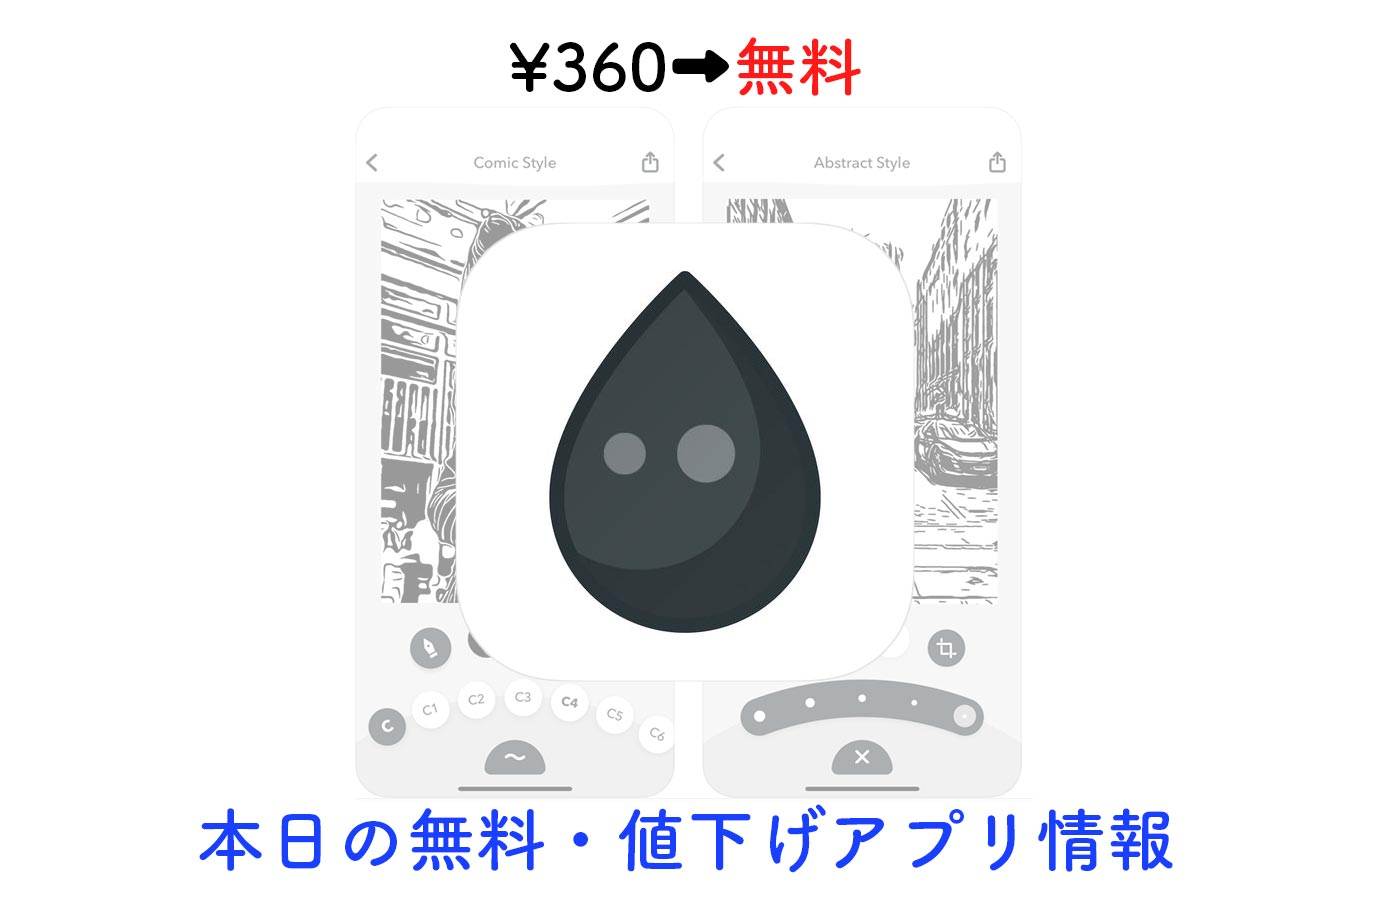 Appsale0505